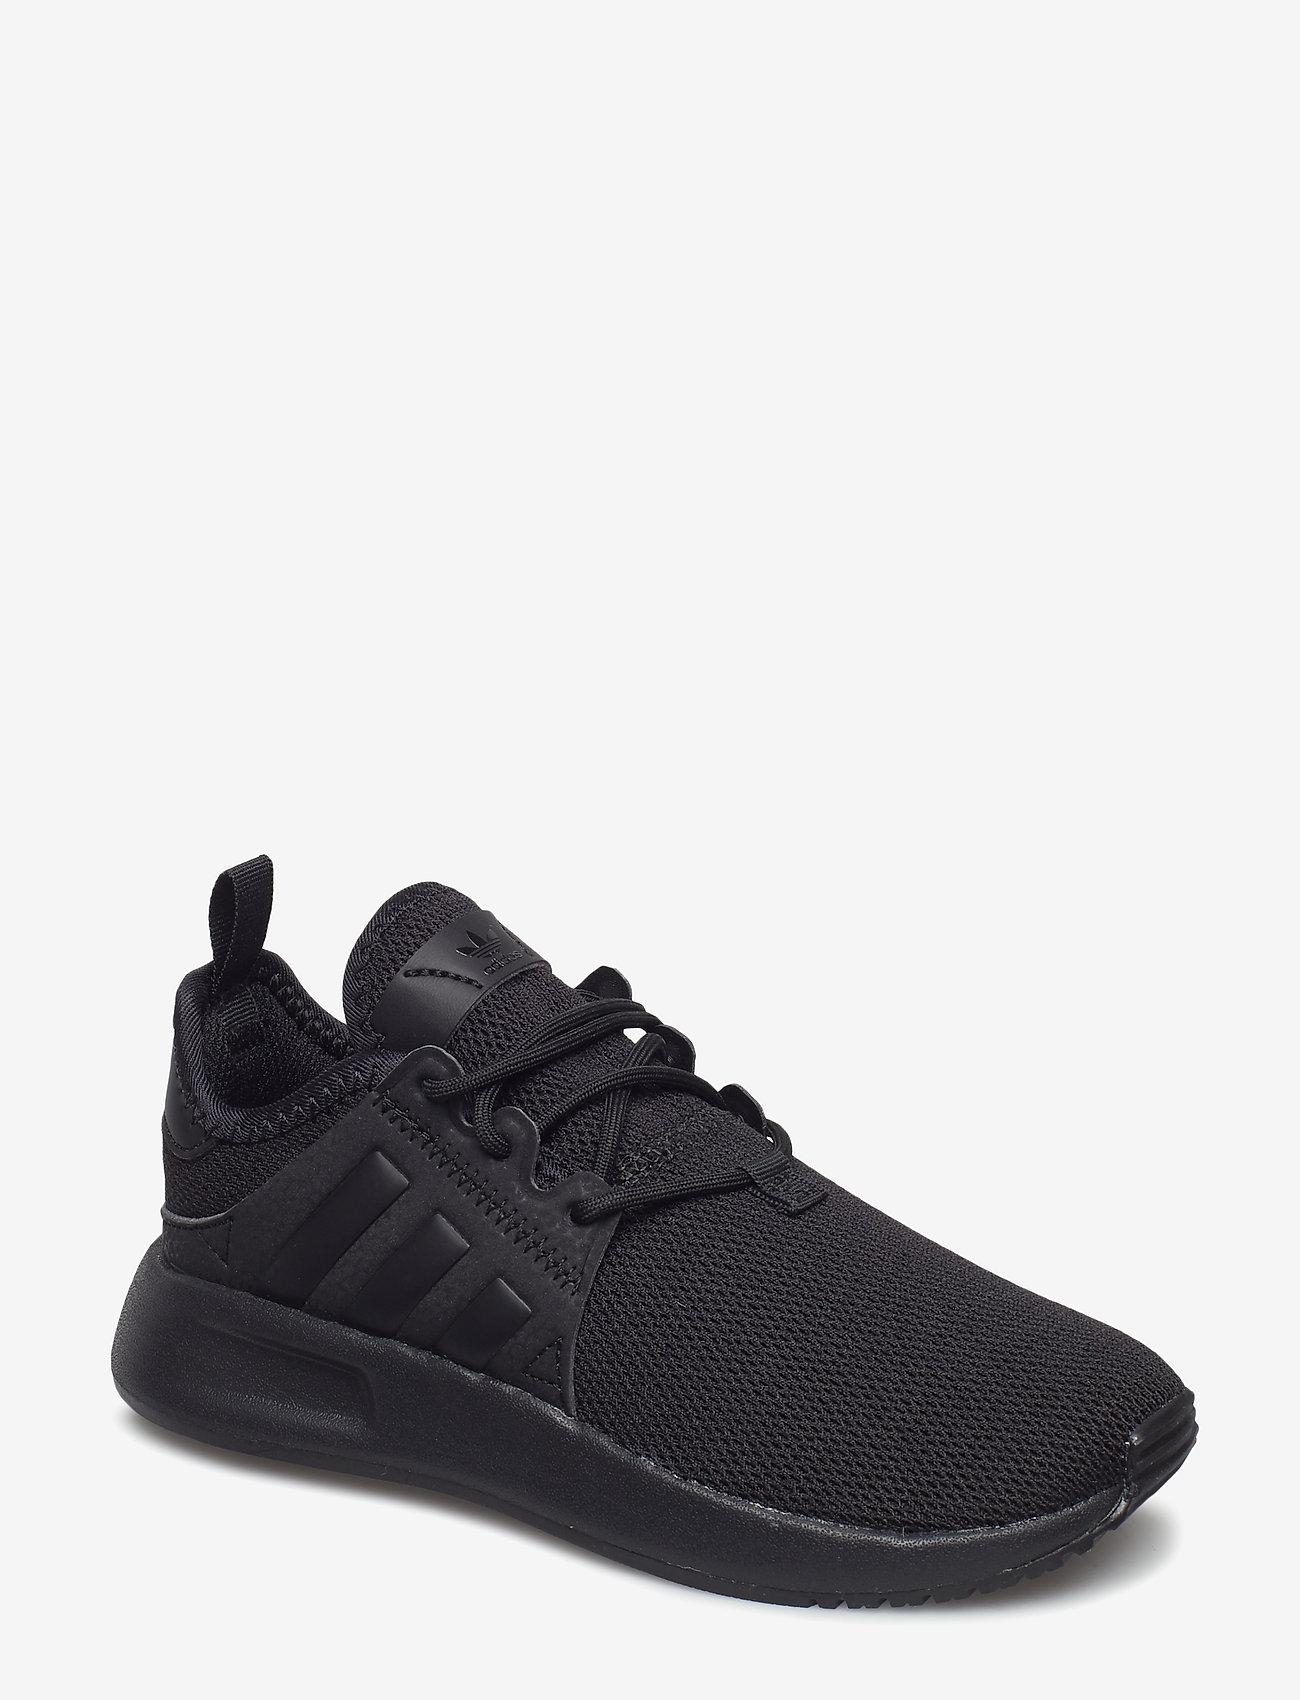 adidas Originals - X_PLR C - schuhe - cblack/cblack/cblack - 0